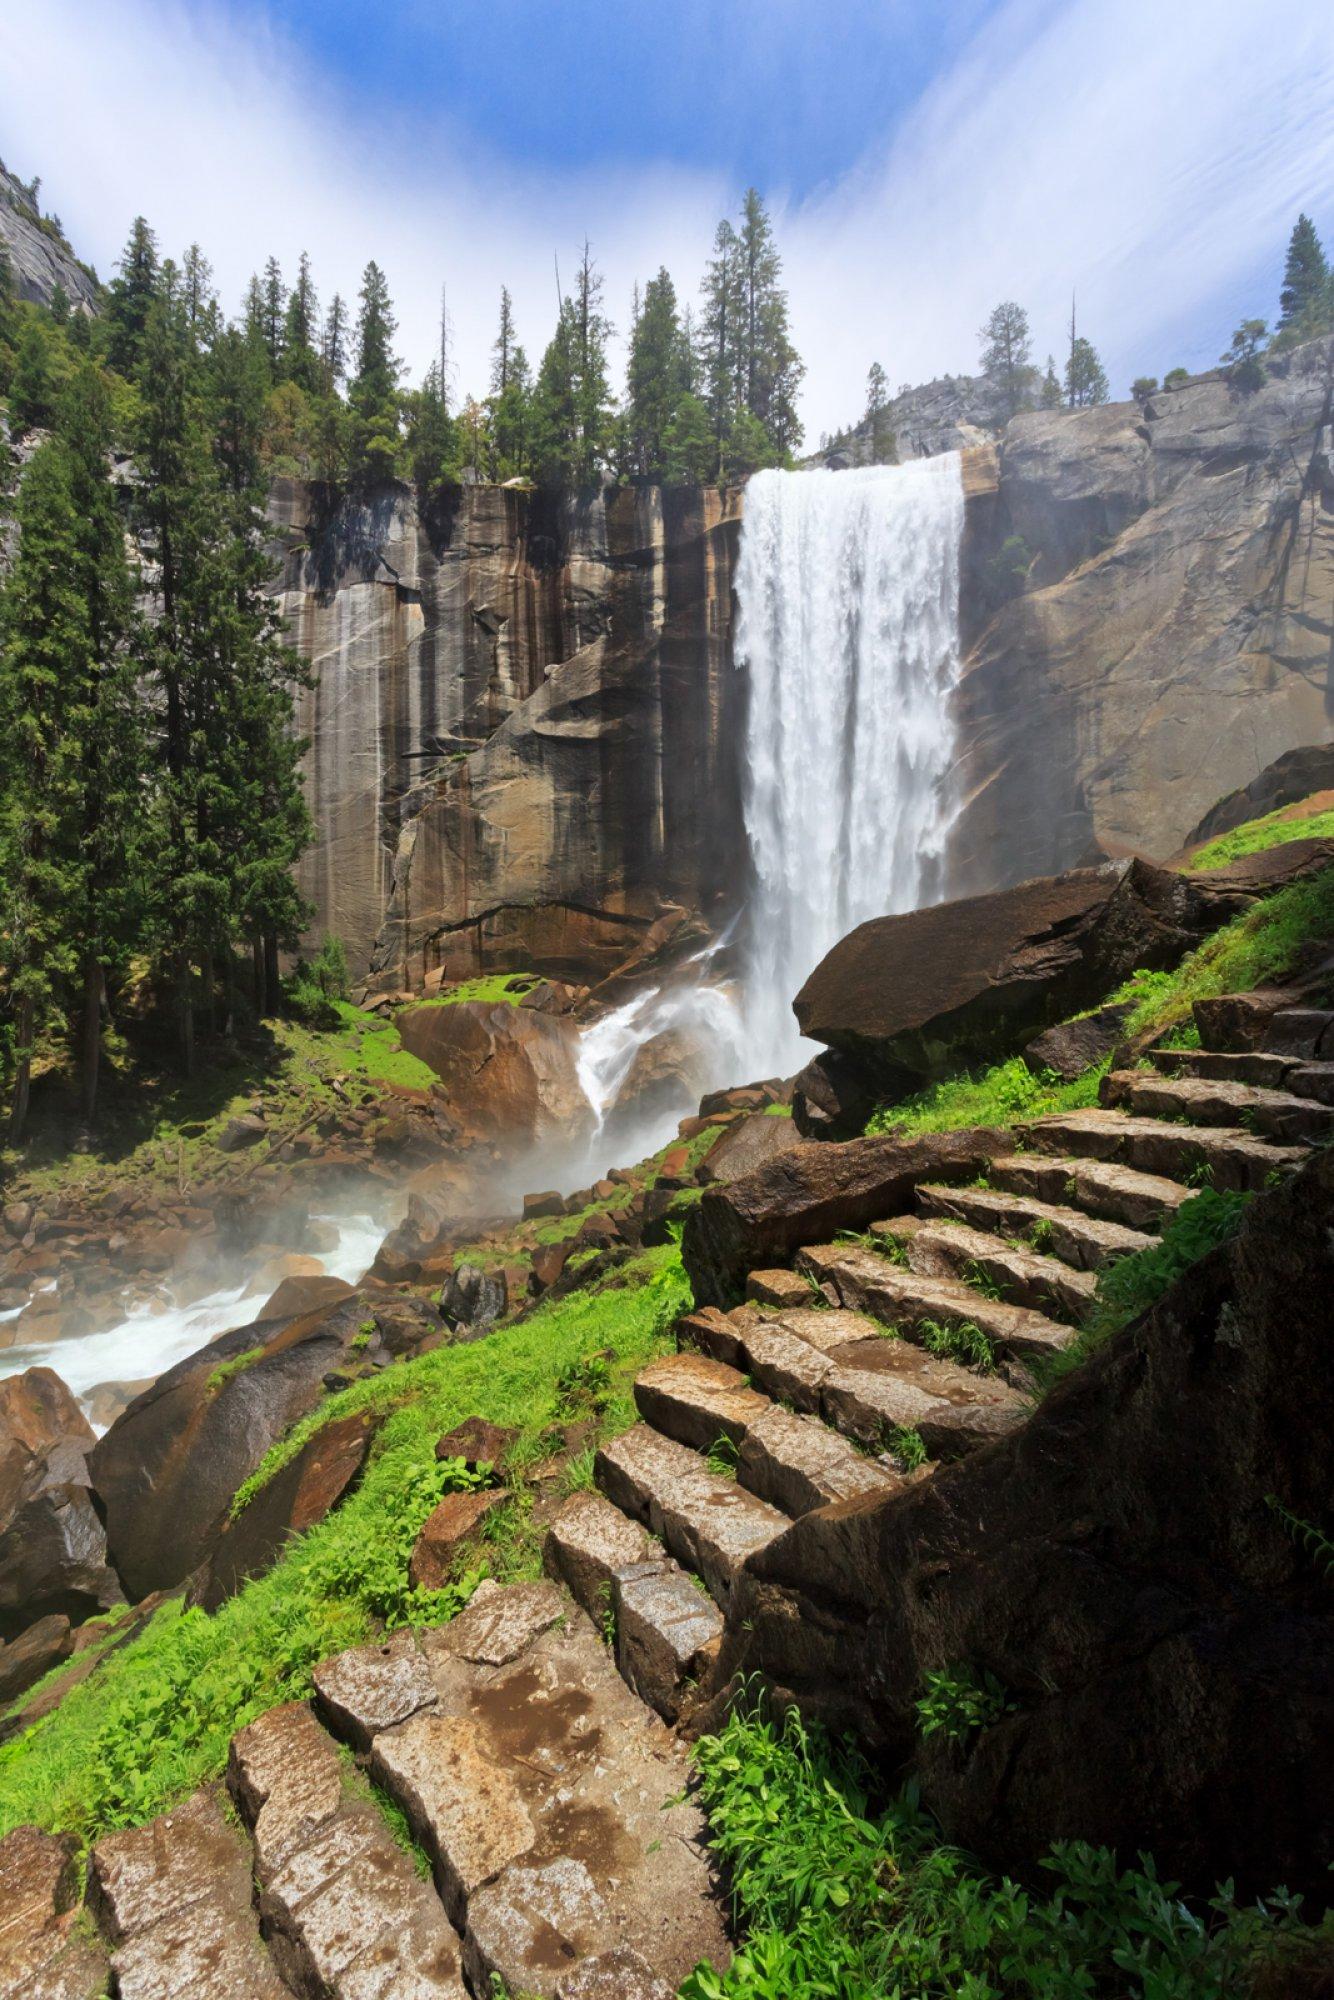 https://bubo.sk/uploads/galleries/4995/yosemity-vernal-falls.jpg